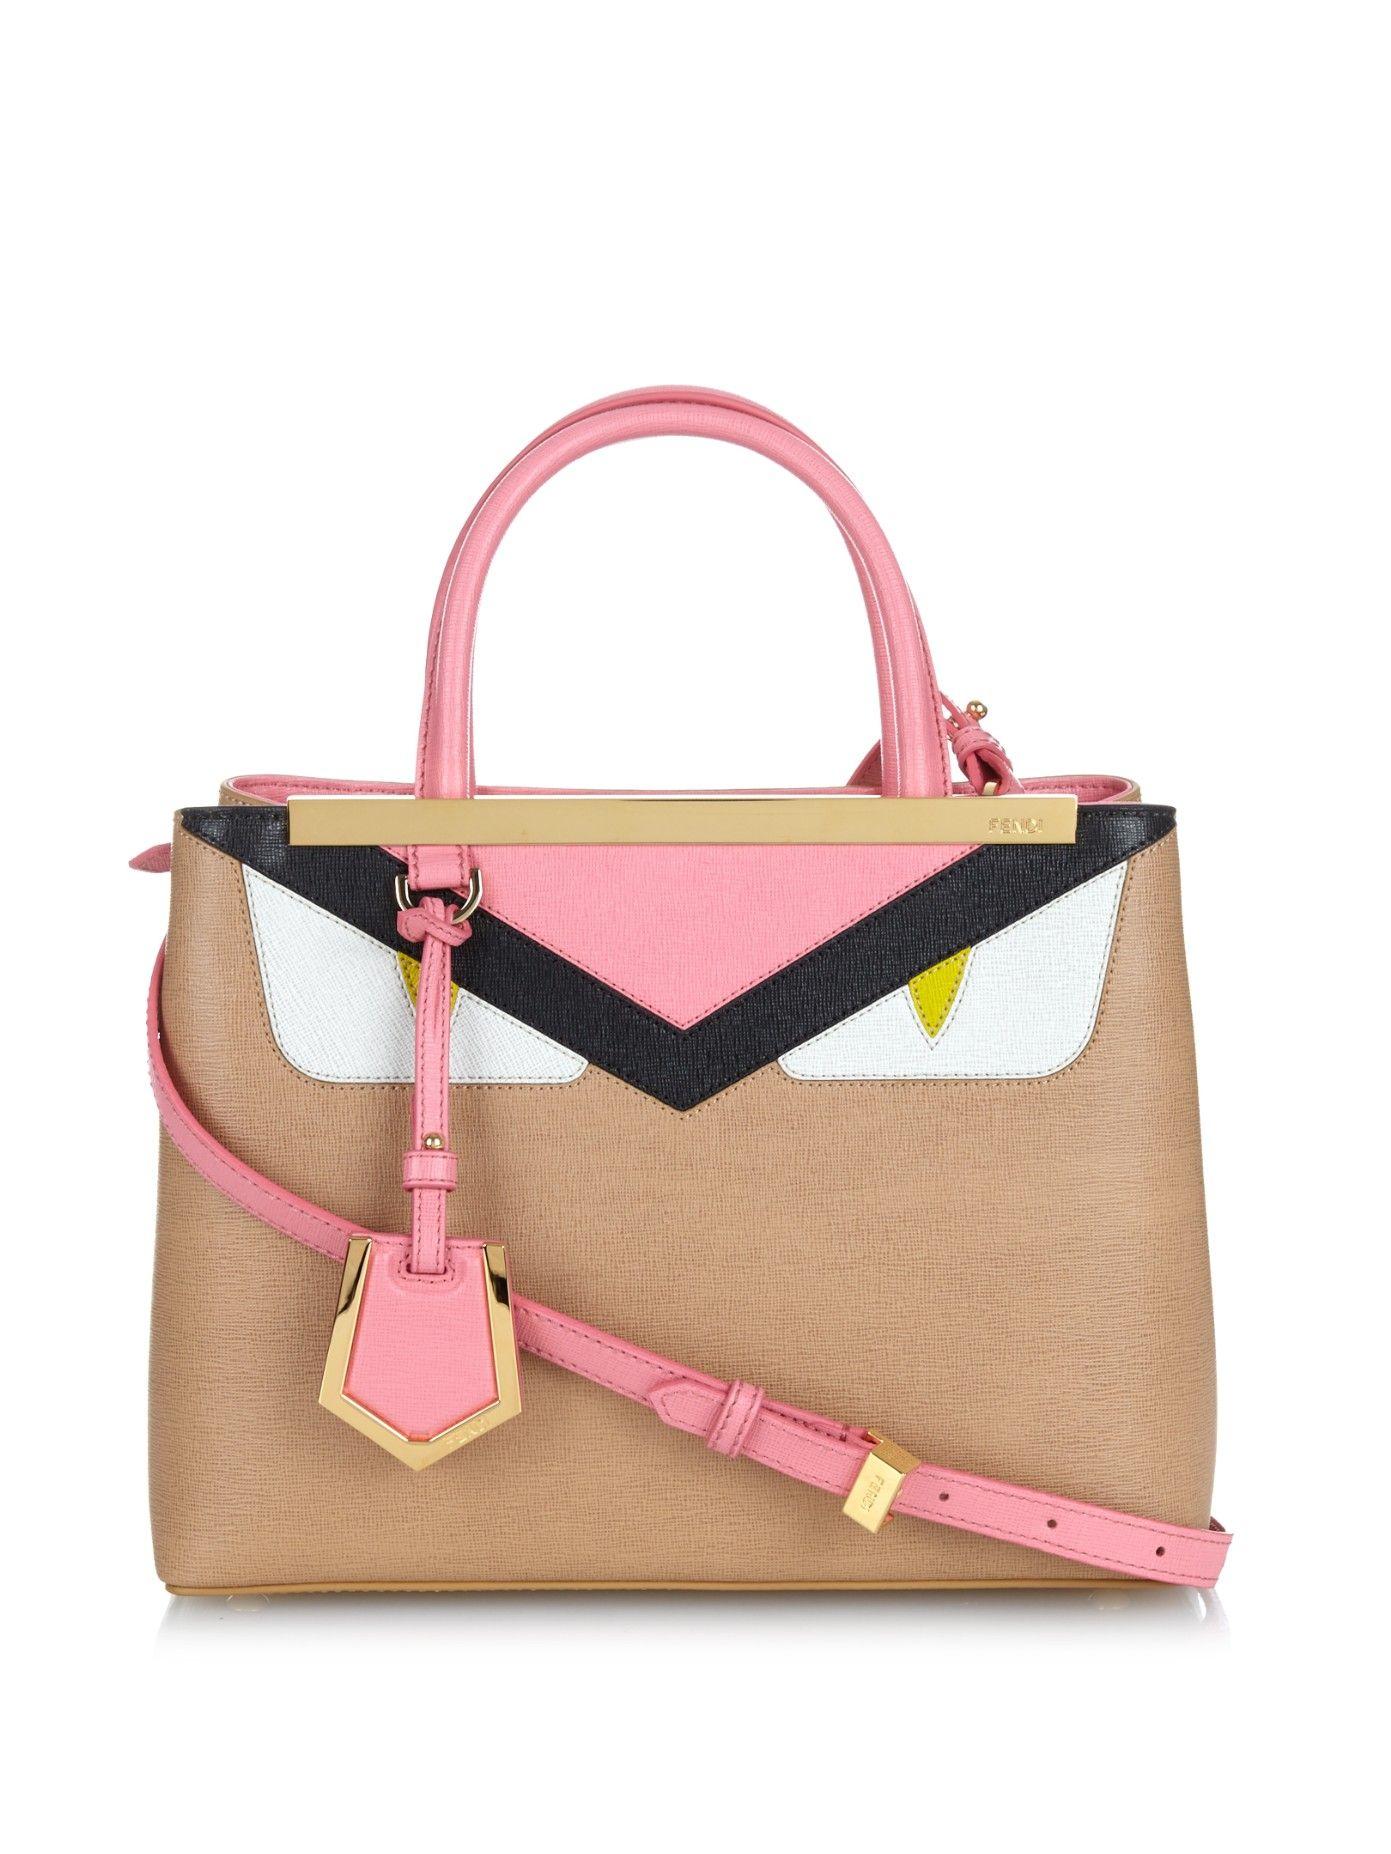 8a1462e6e8 Petite 2Jours Bag Bugs leather cross-body bag by Fendi